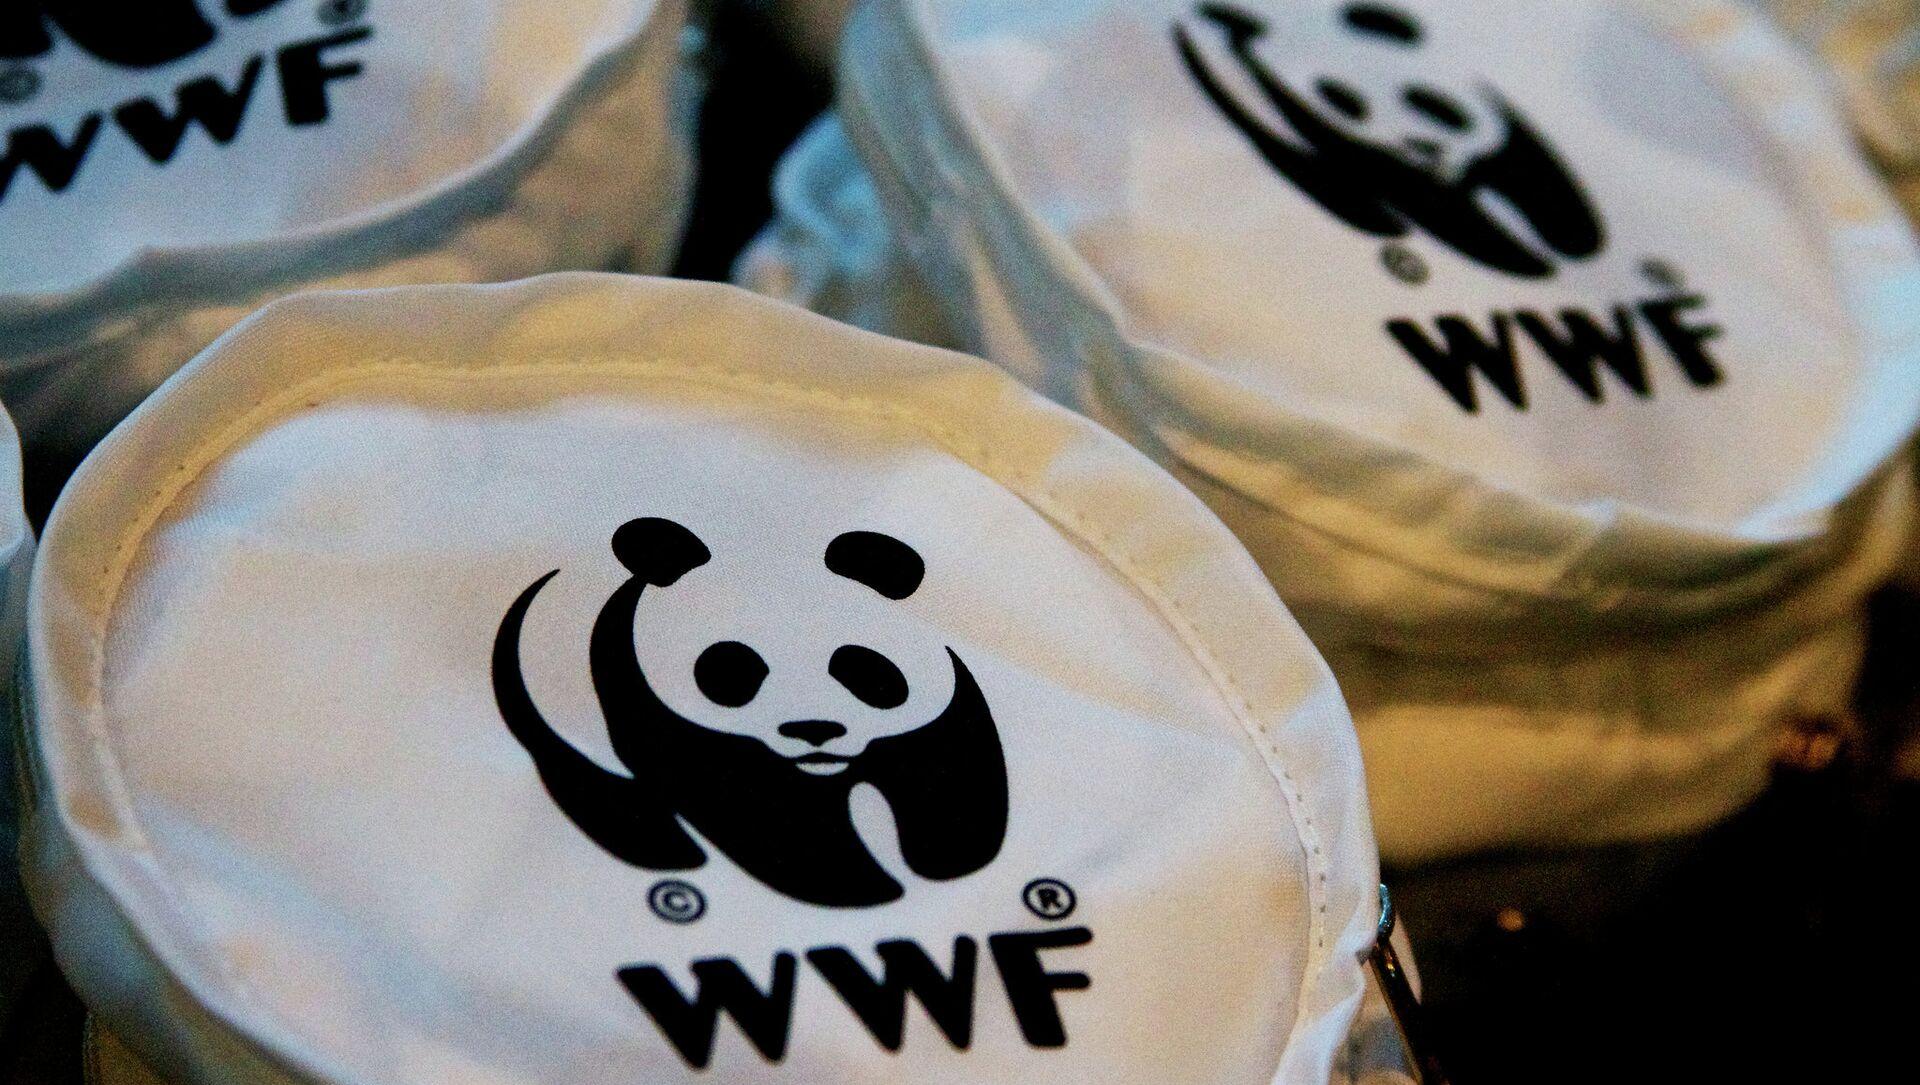 World Wildlife Fund - Sputnik Italia, 1920, 09.10.2020